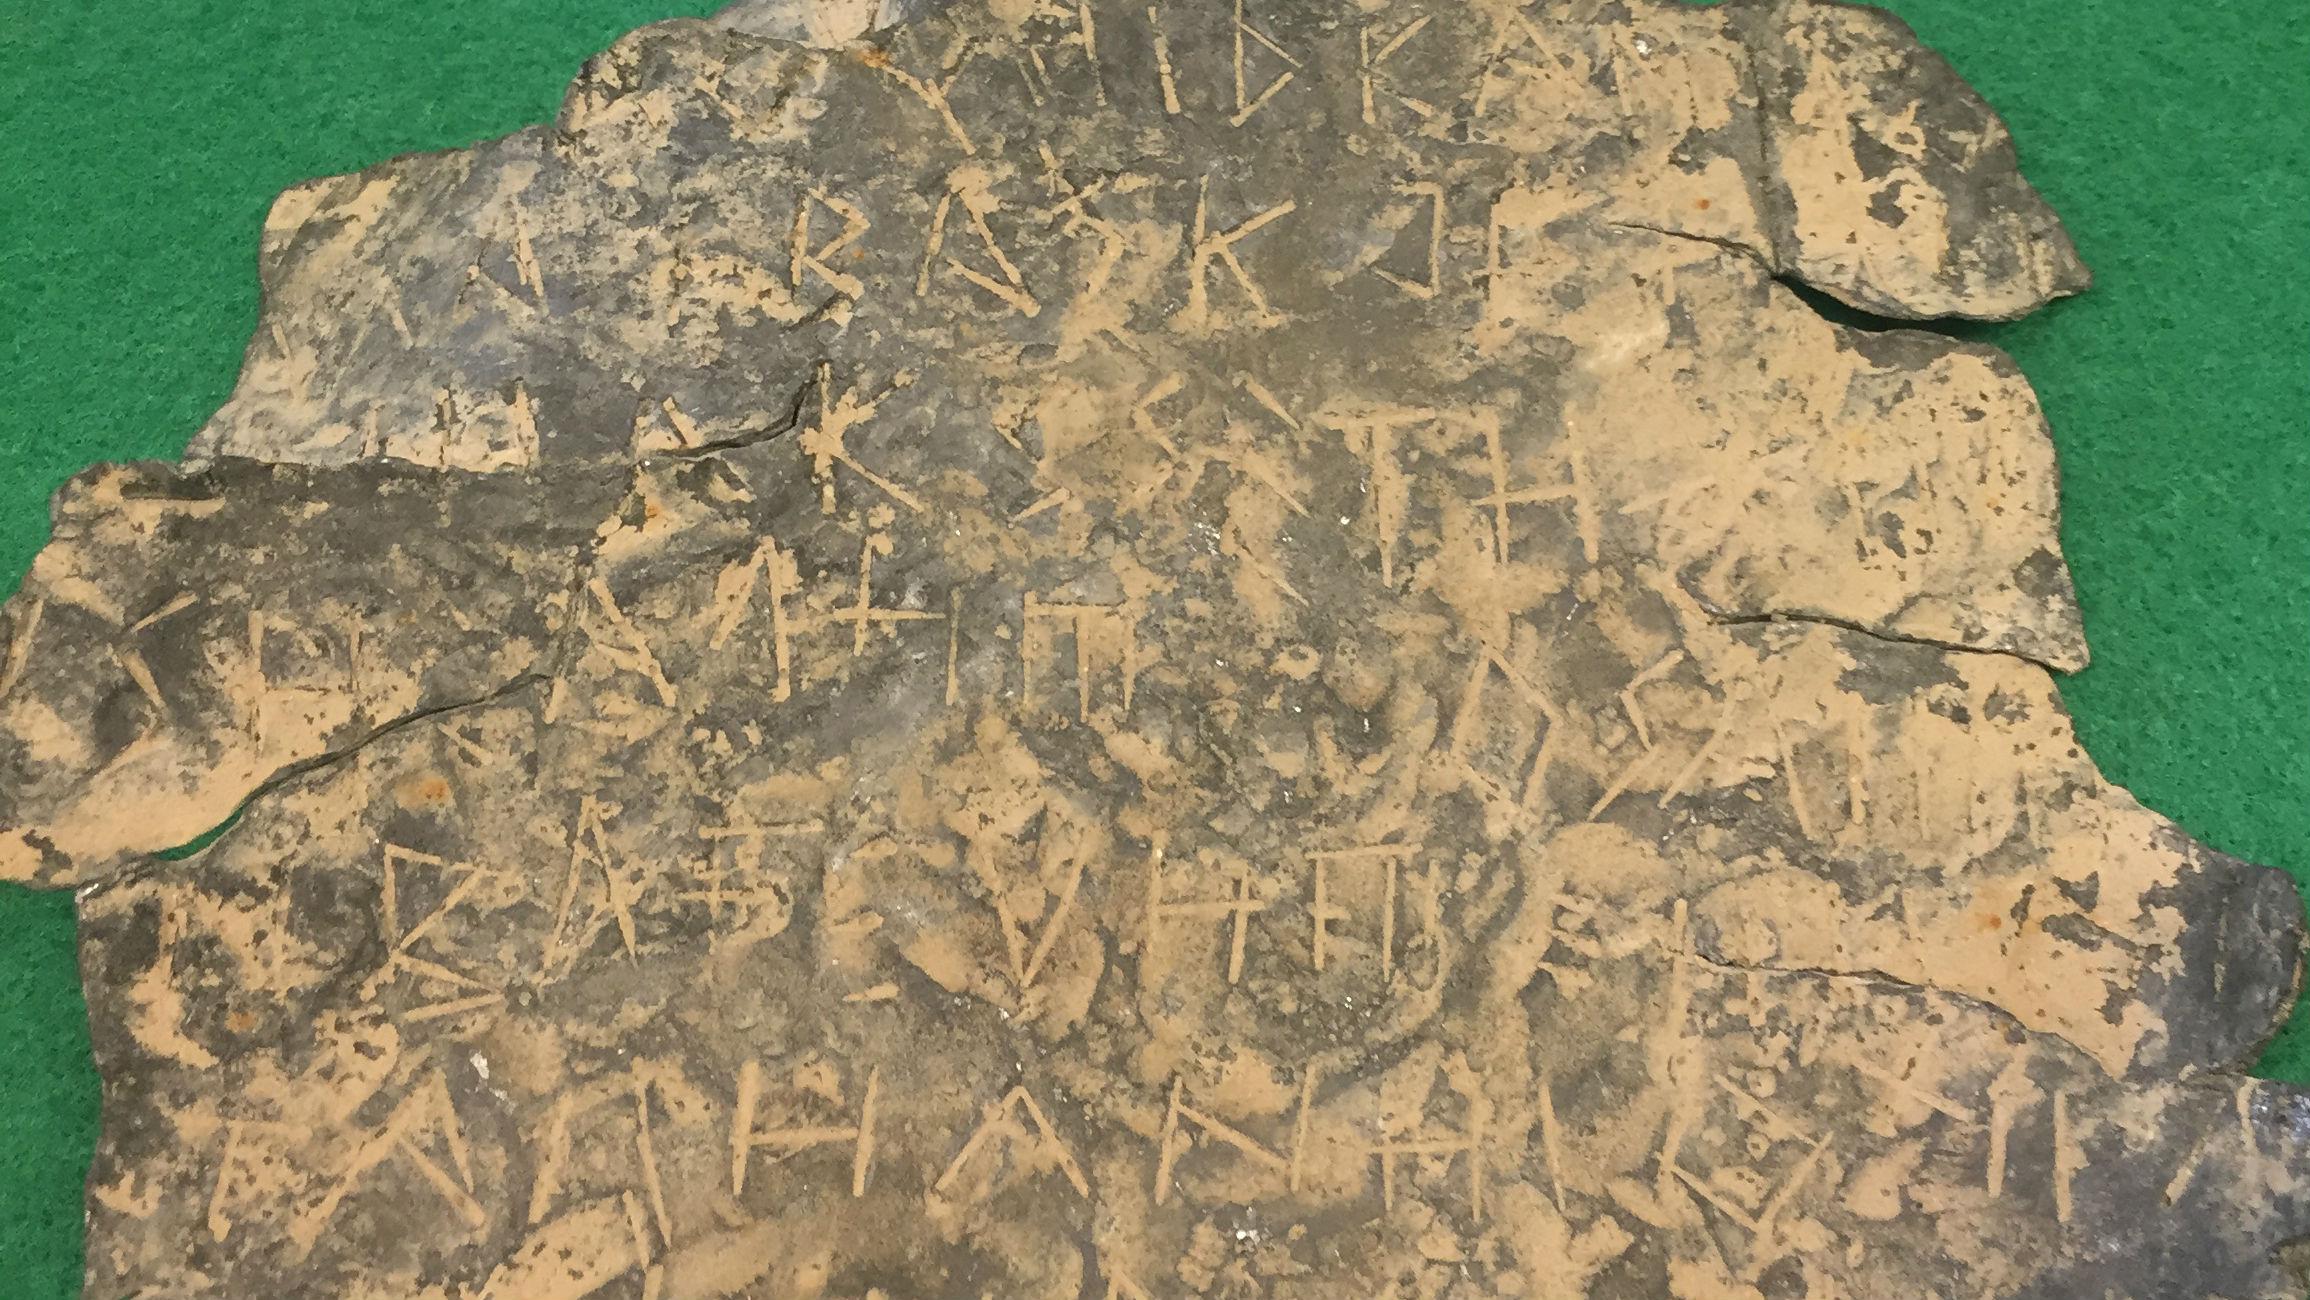 La lámina ibera escrita tiene una antigüedad aproximada de 24 siglos